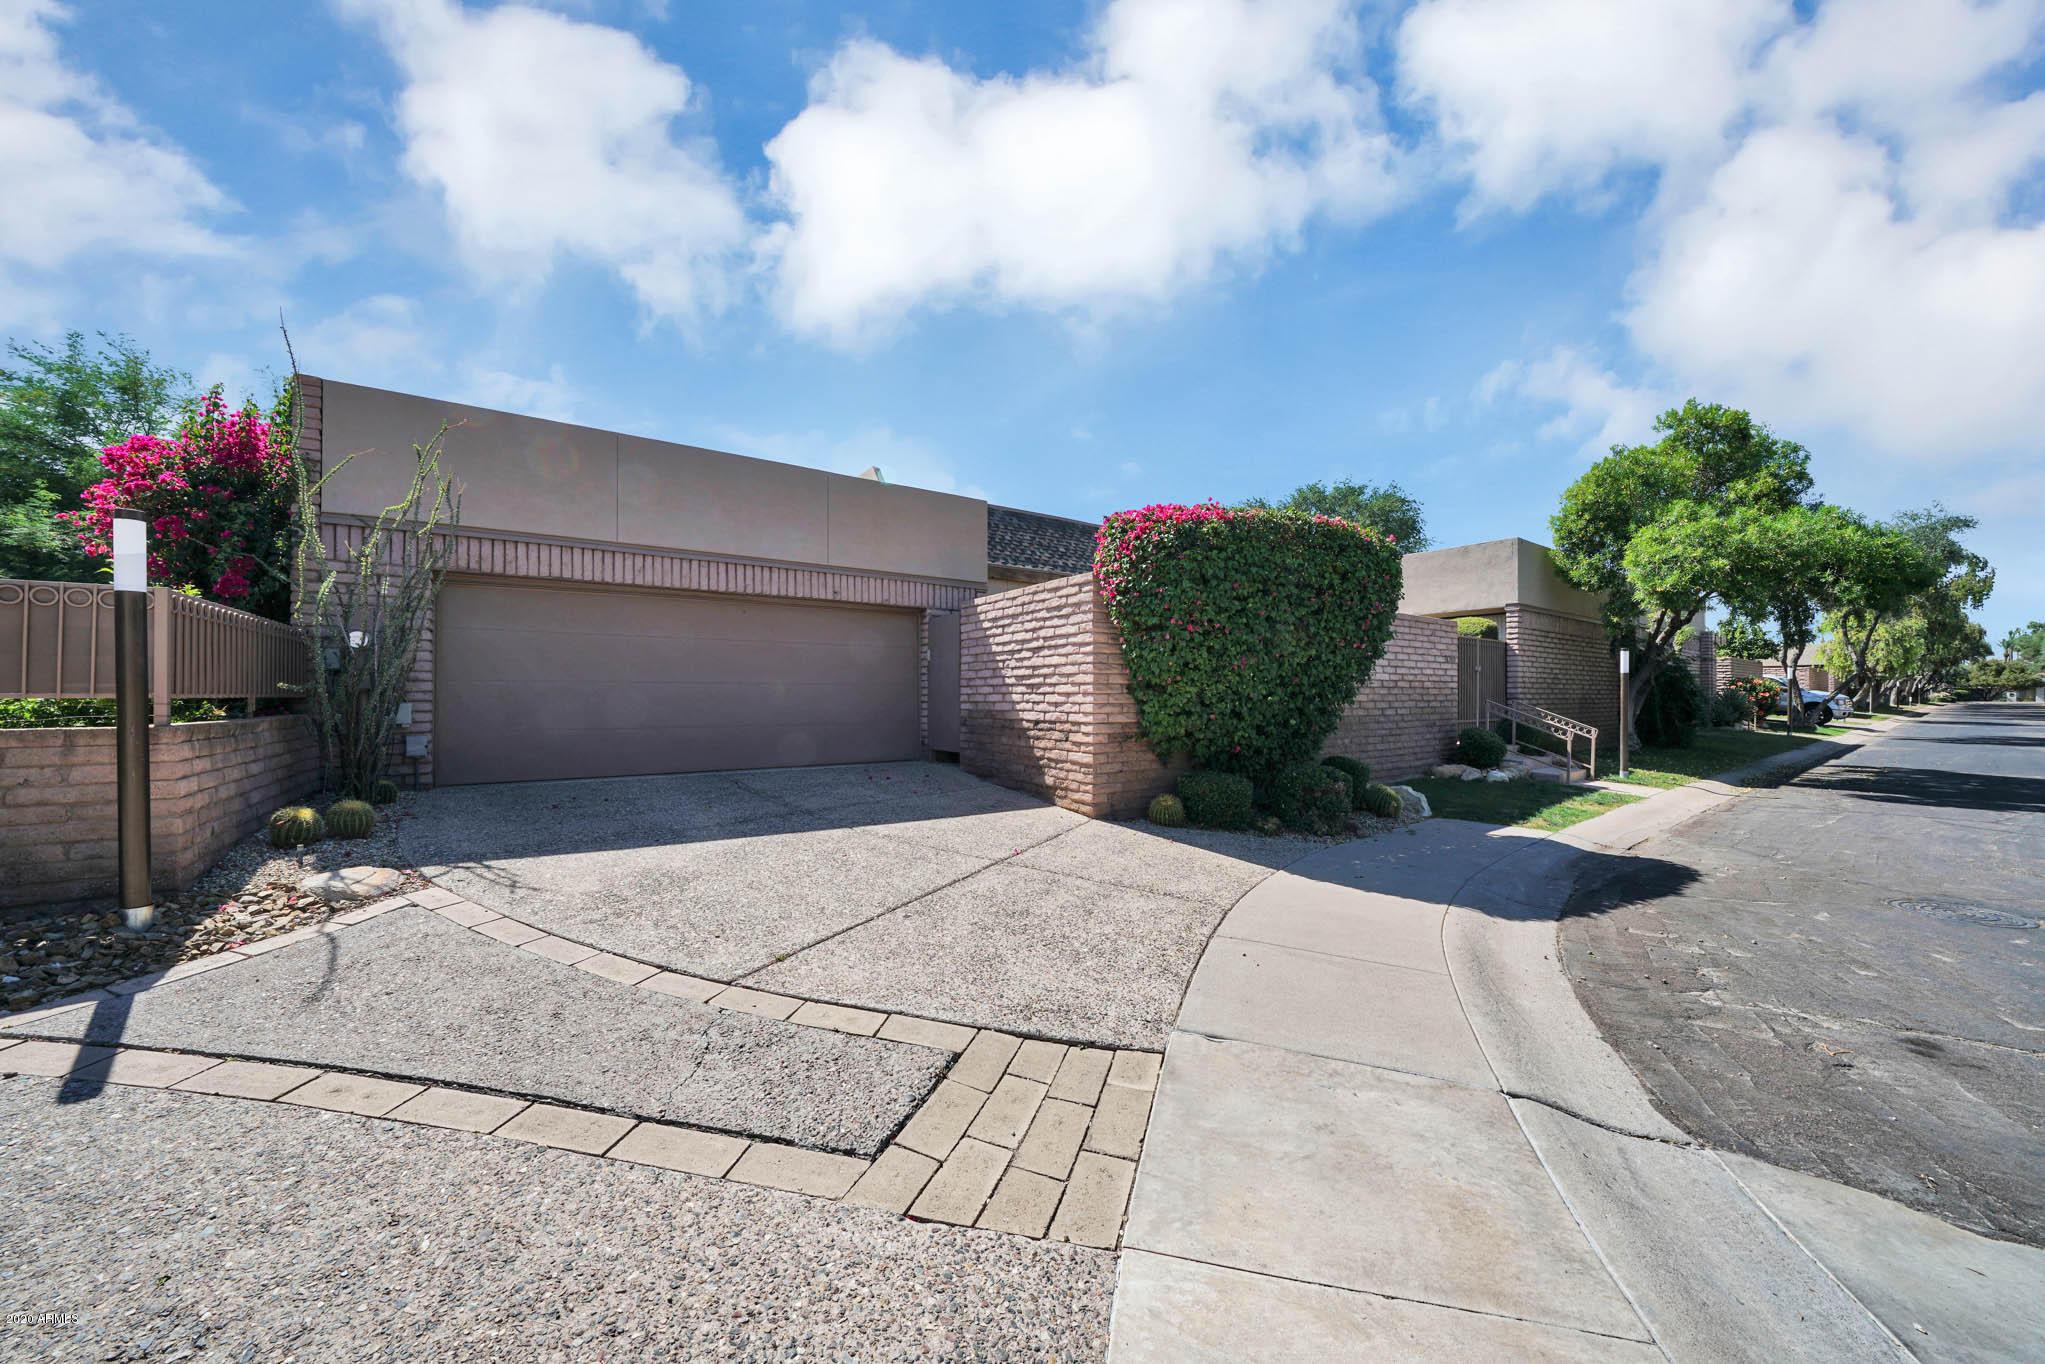 Photo of 7044 N 11TH Drive, Phoenix, AZ 85021